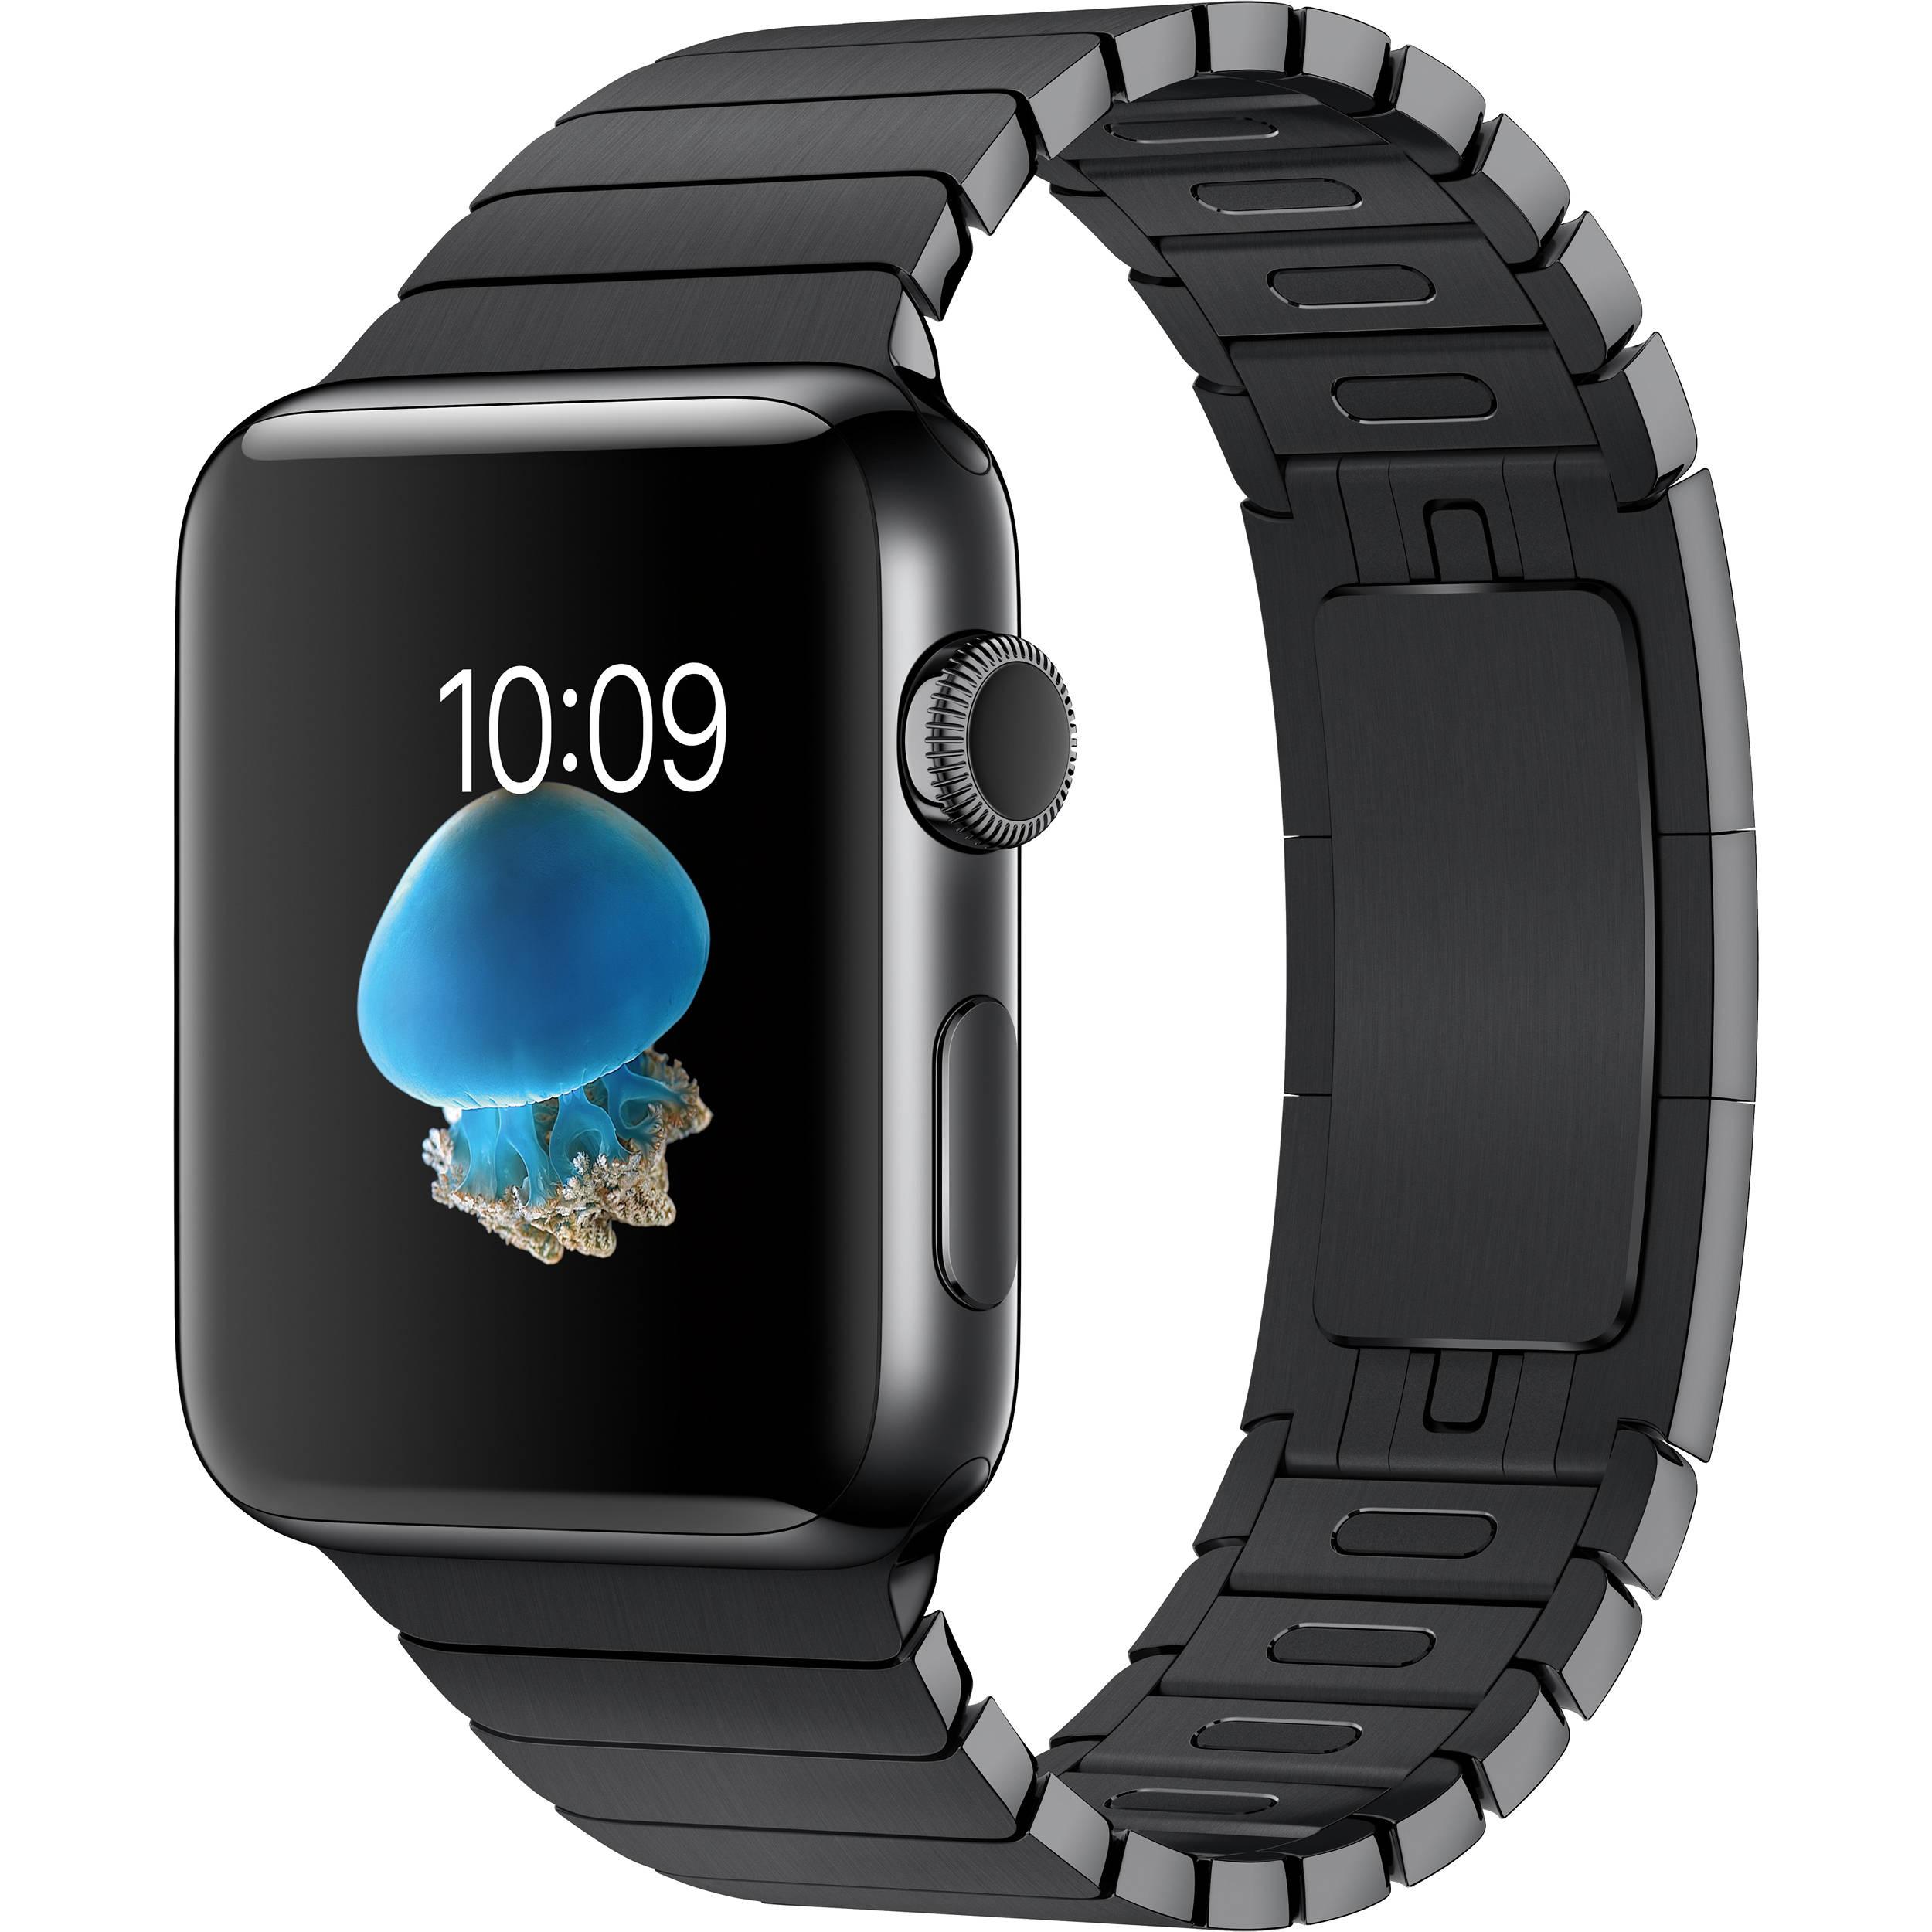 Ремешок Metal Link Band для Apple Watch 42mm (Black)